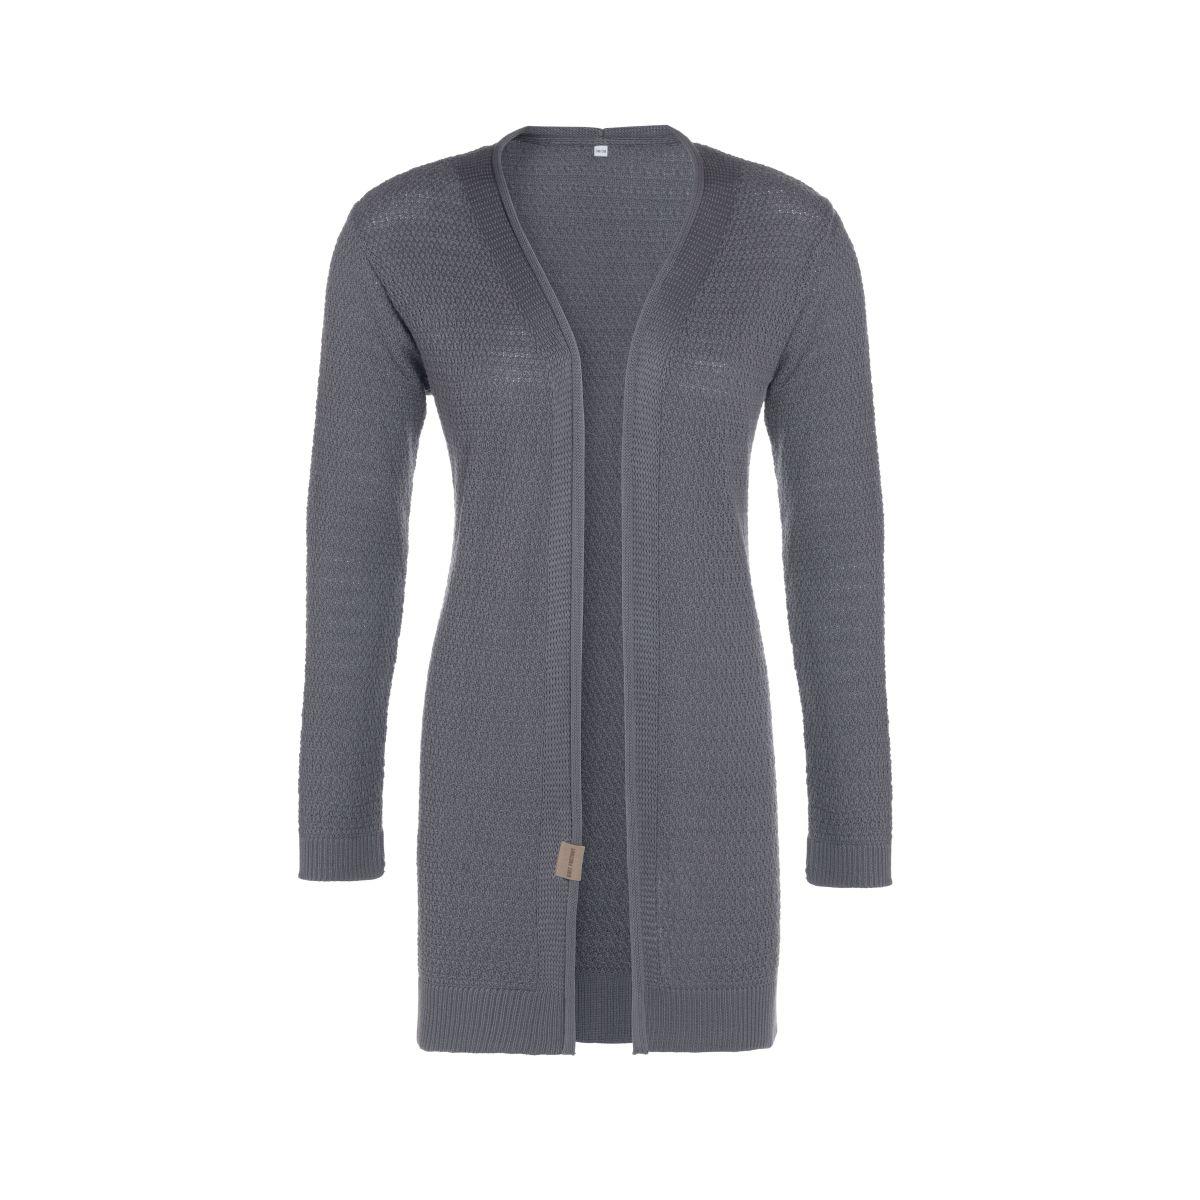 june knitted cardigan med grey 4042